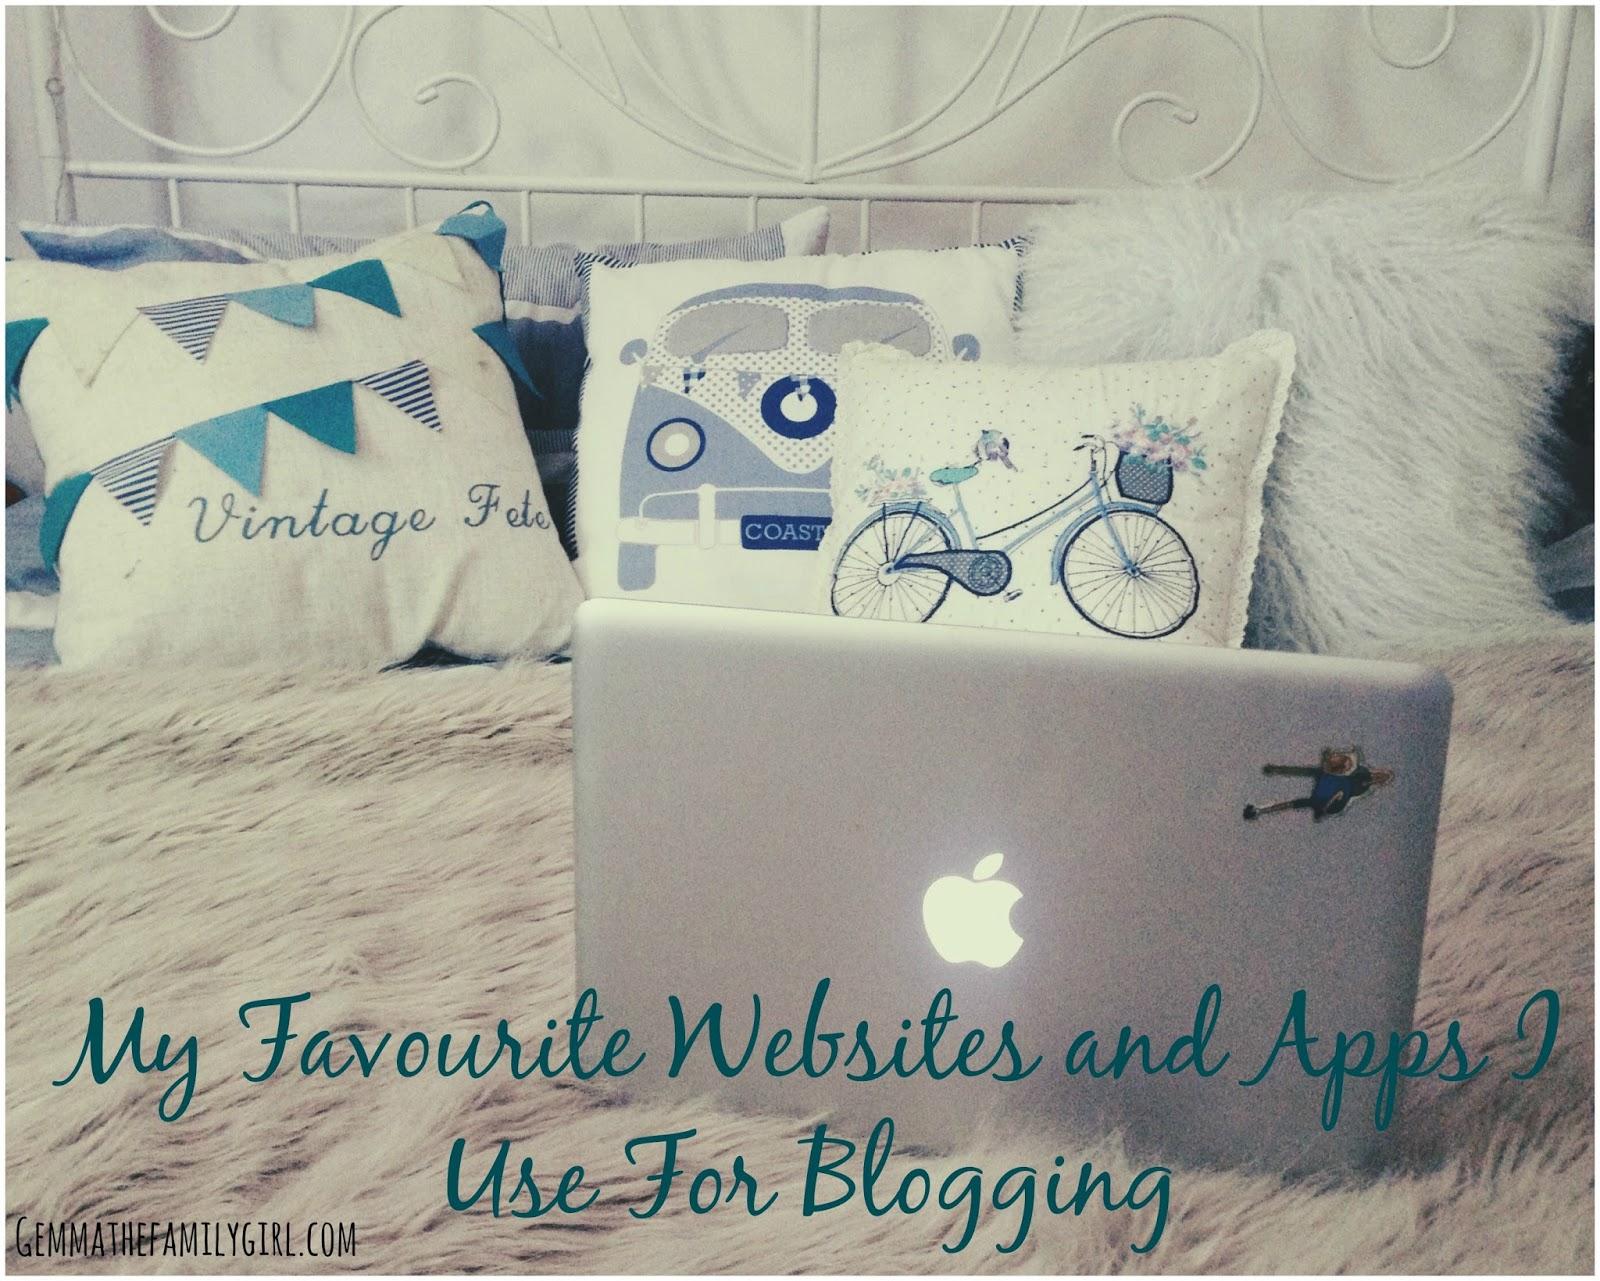 blogging tips, blogger, top blogger, websites, writing, photo editing,